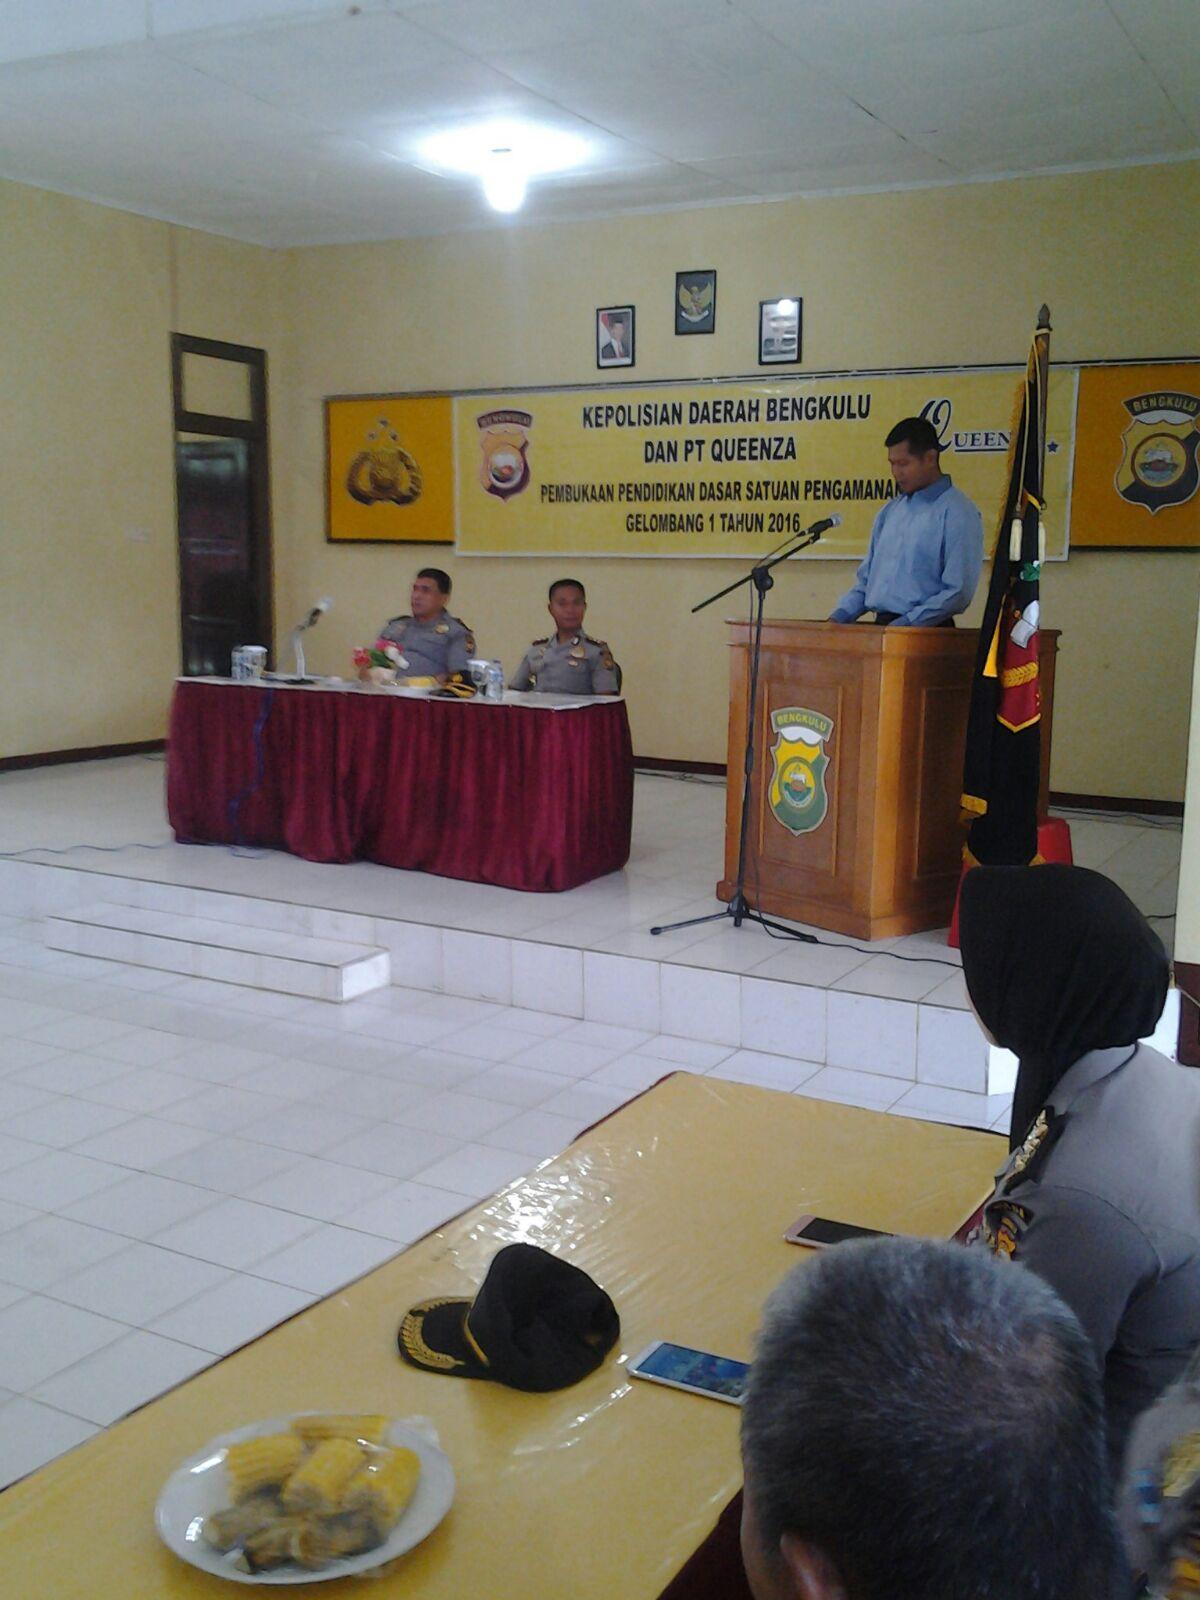 Sinergi Kepolisian, Gandeng Satuan Pengamanan